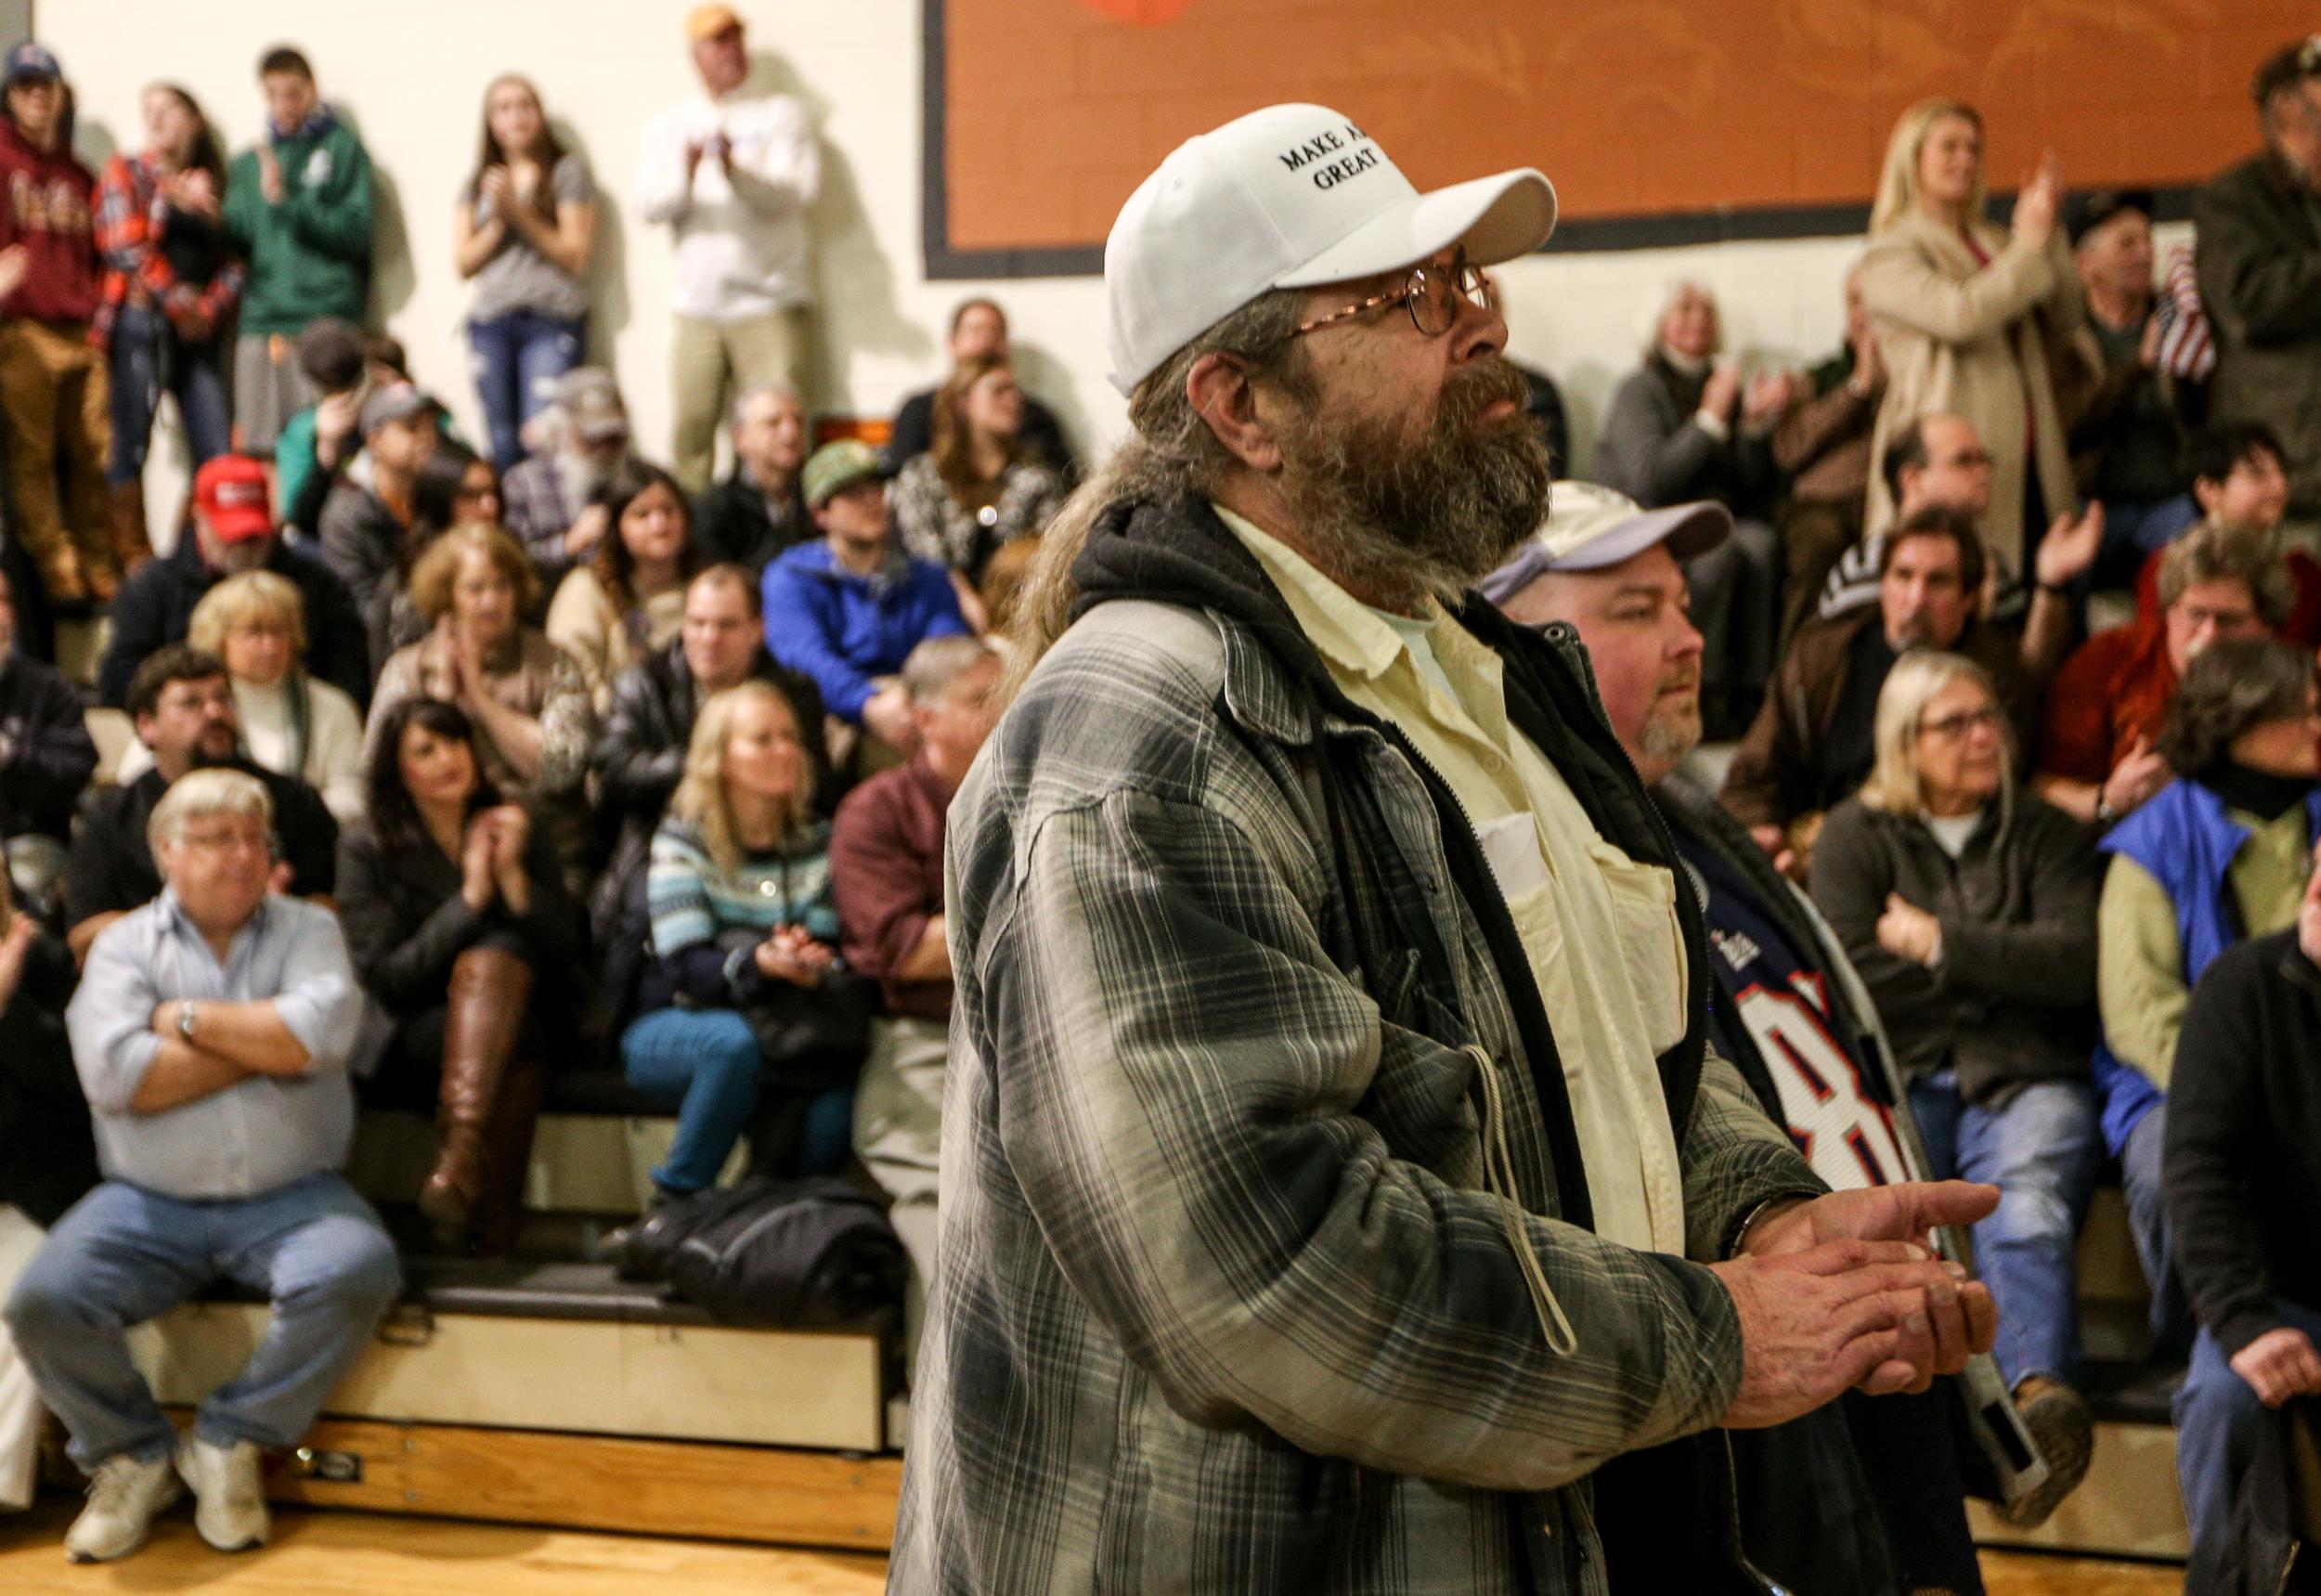 Chris Hanson of South Barris, Maine listens to U.S. presidential candidate Donald Trump speak during aat a Donald J. Trump for President Rally at Farmington High School, 40 Thayer Dr., Farmington, NH on Jan. 26, 2016.